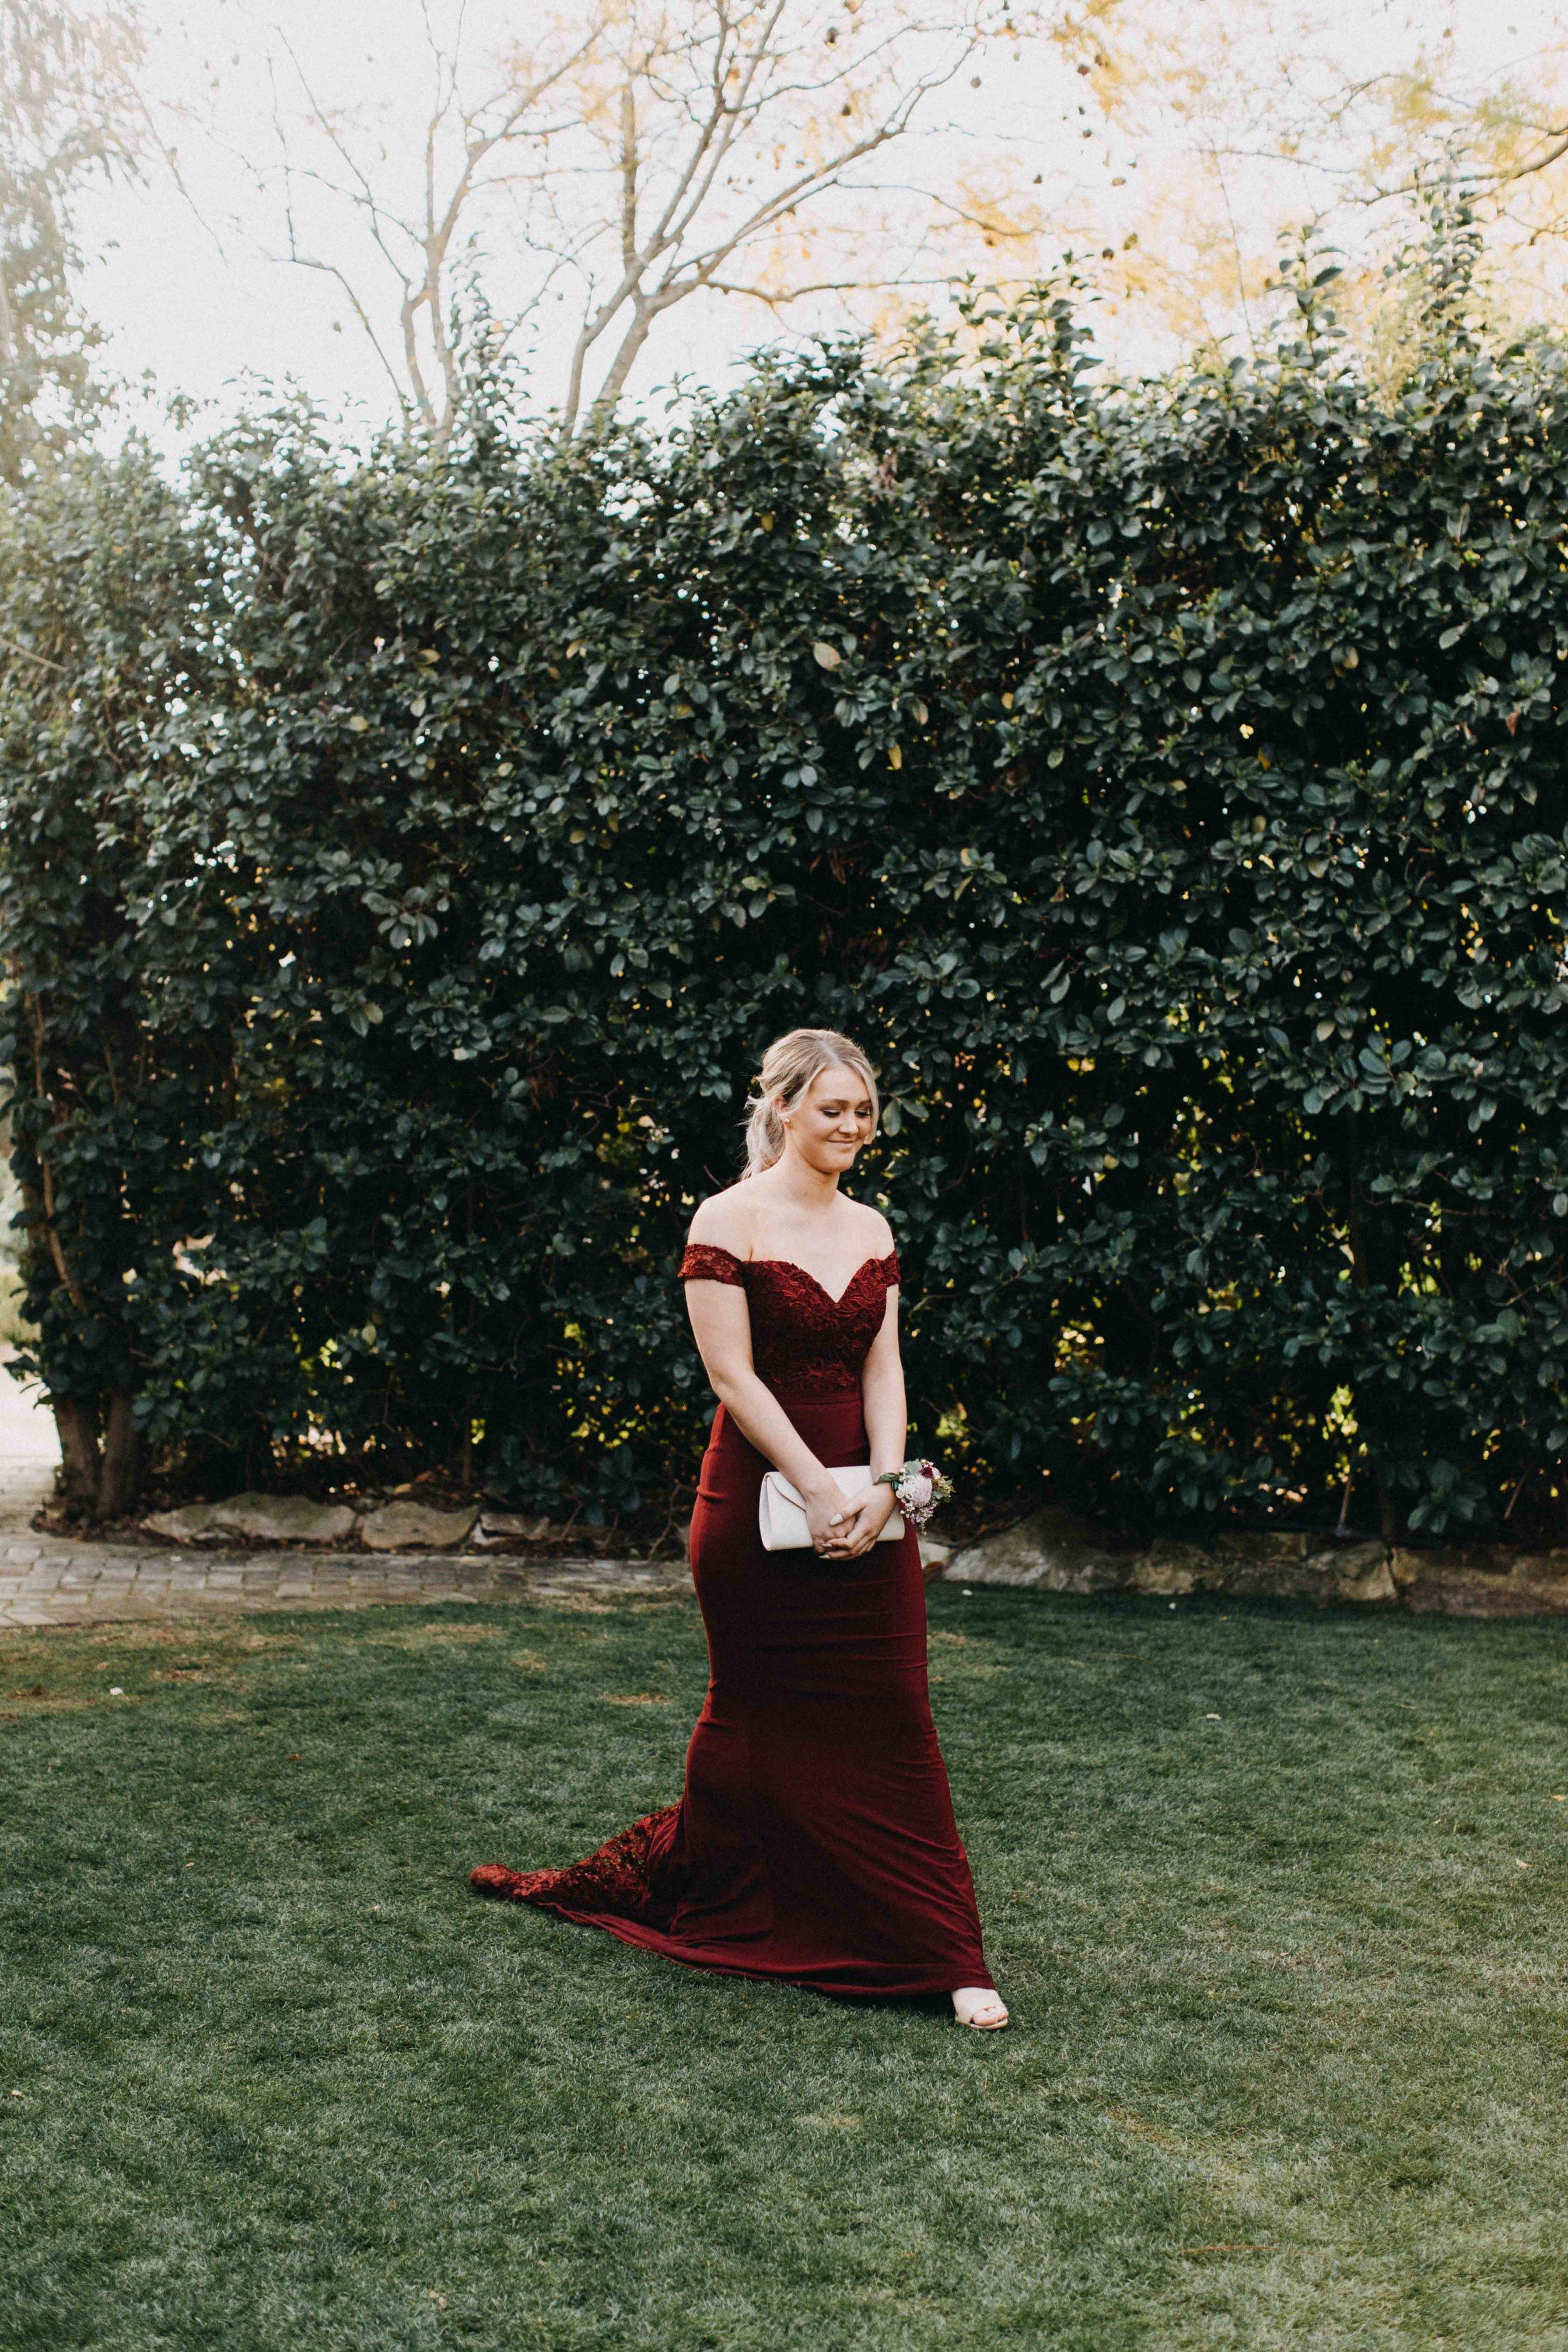 burnham-grove-camden-wedding-emilyobrienphotography-macarthur-53.jpg